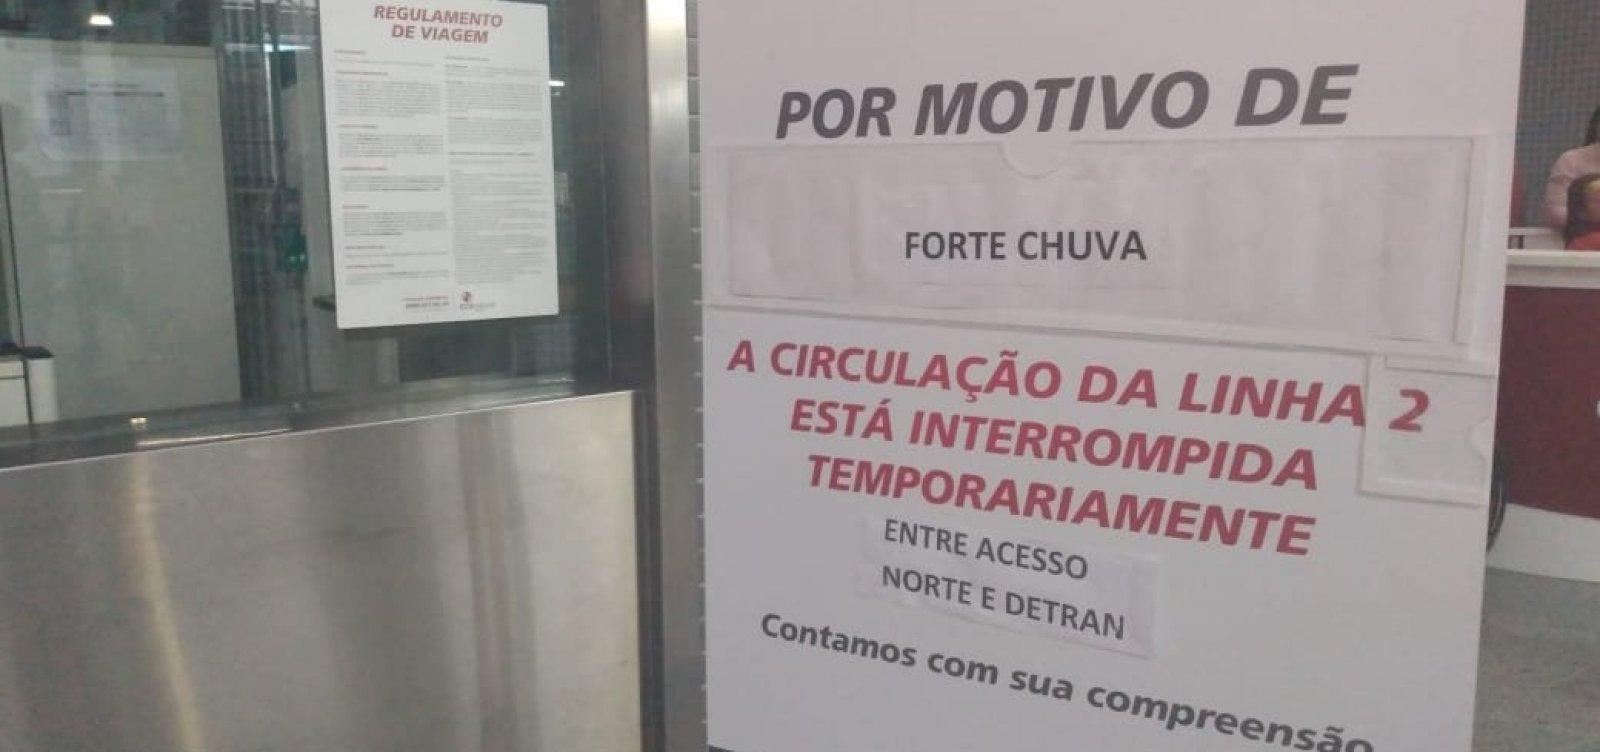 Linha 2 do metrô de Salvador volta a funcionar após alagamento